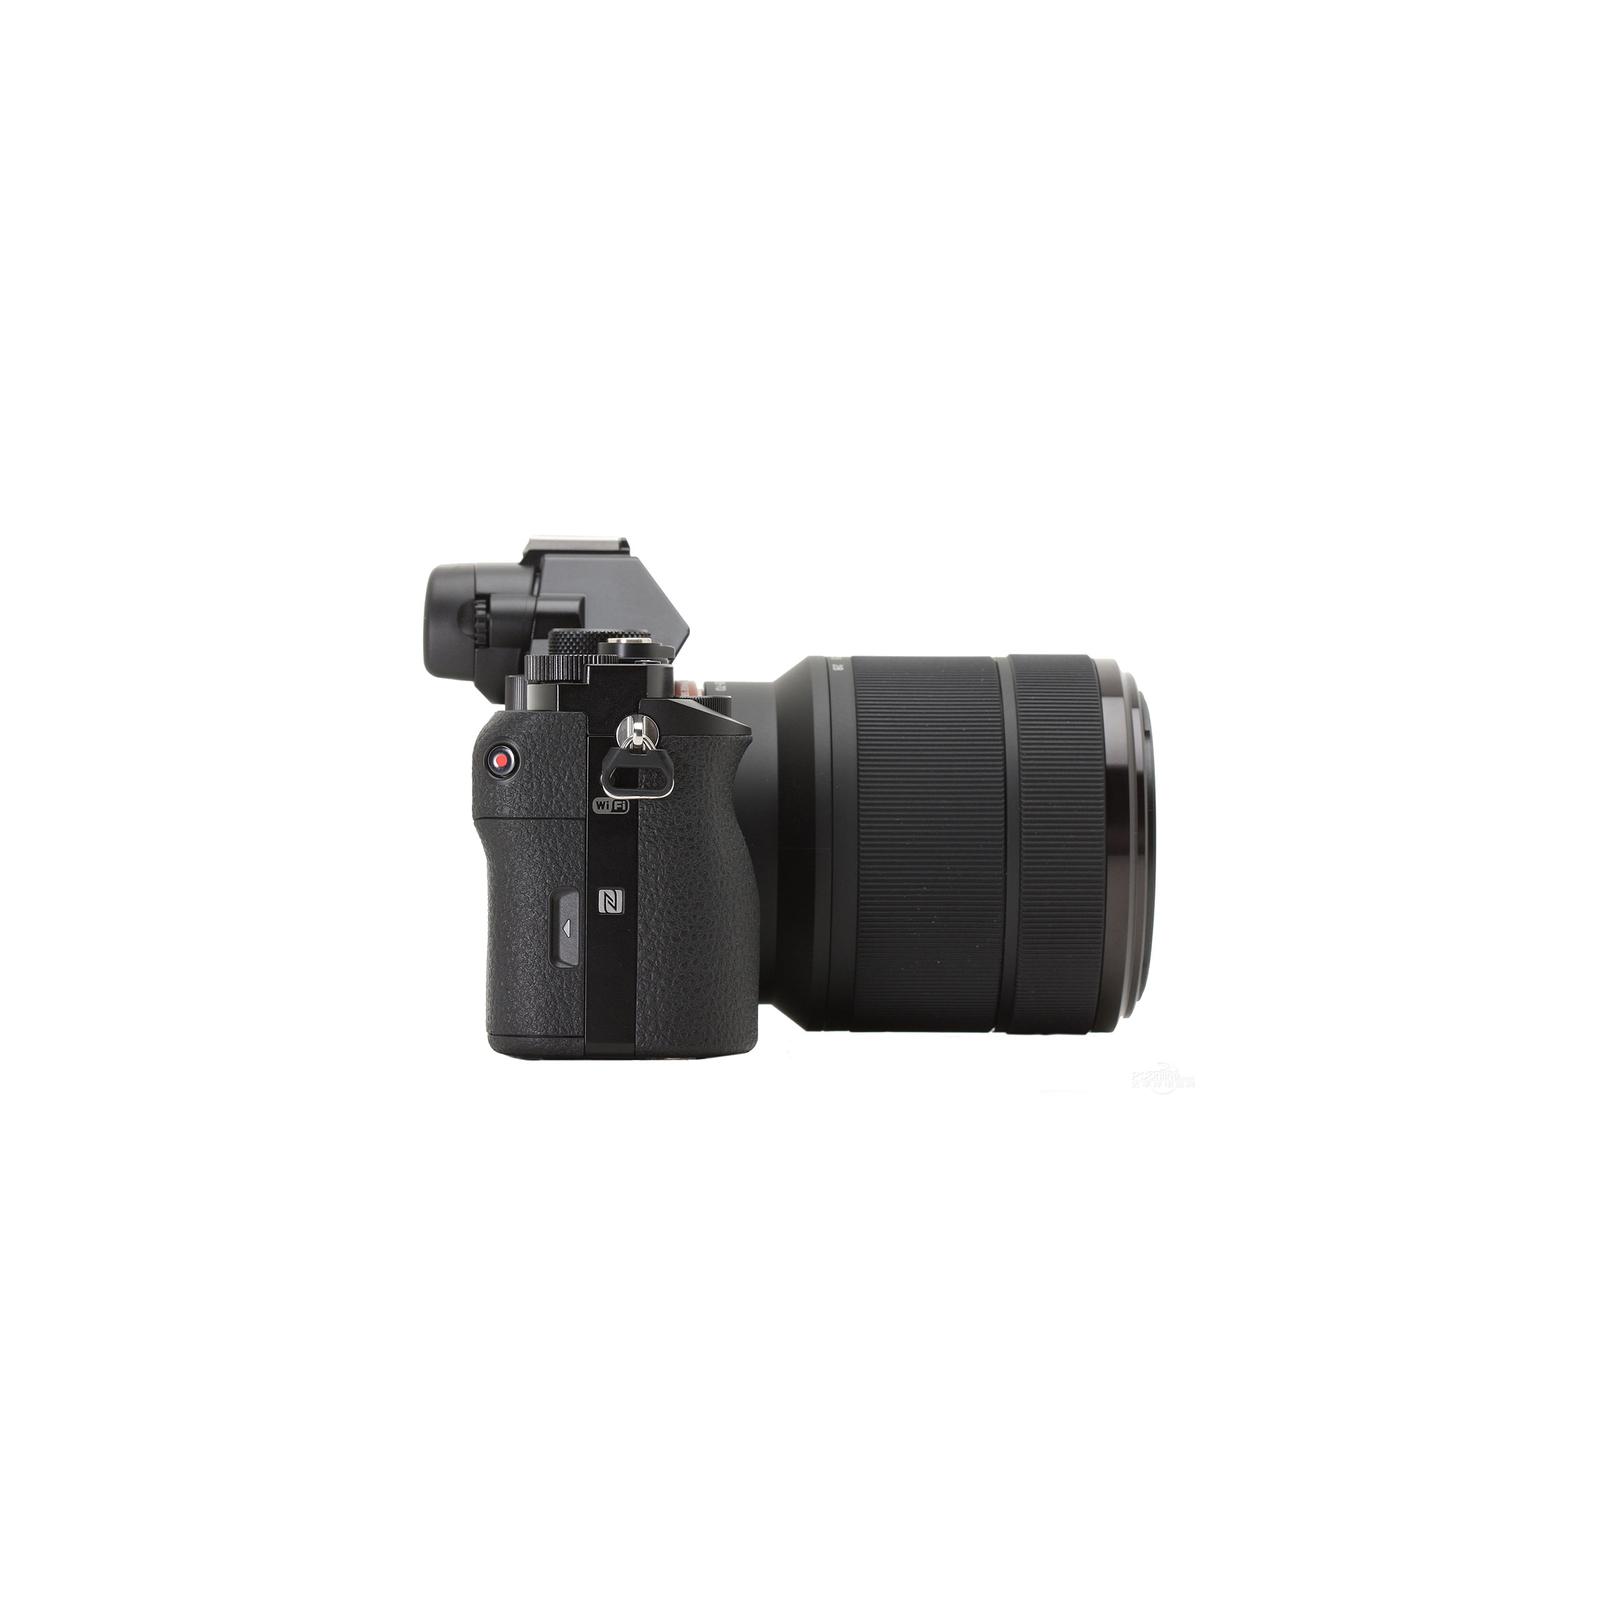 Цифровой фотоаппарат SONY Alpha 7 28-70 kit black (ILCE7KB.RU2) изображение 8